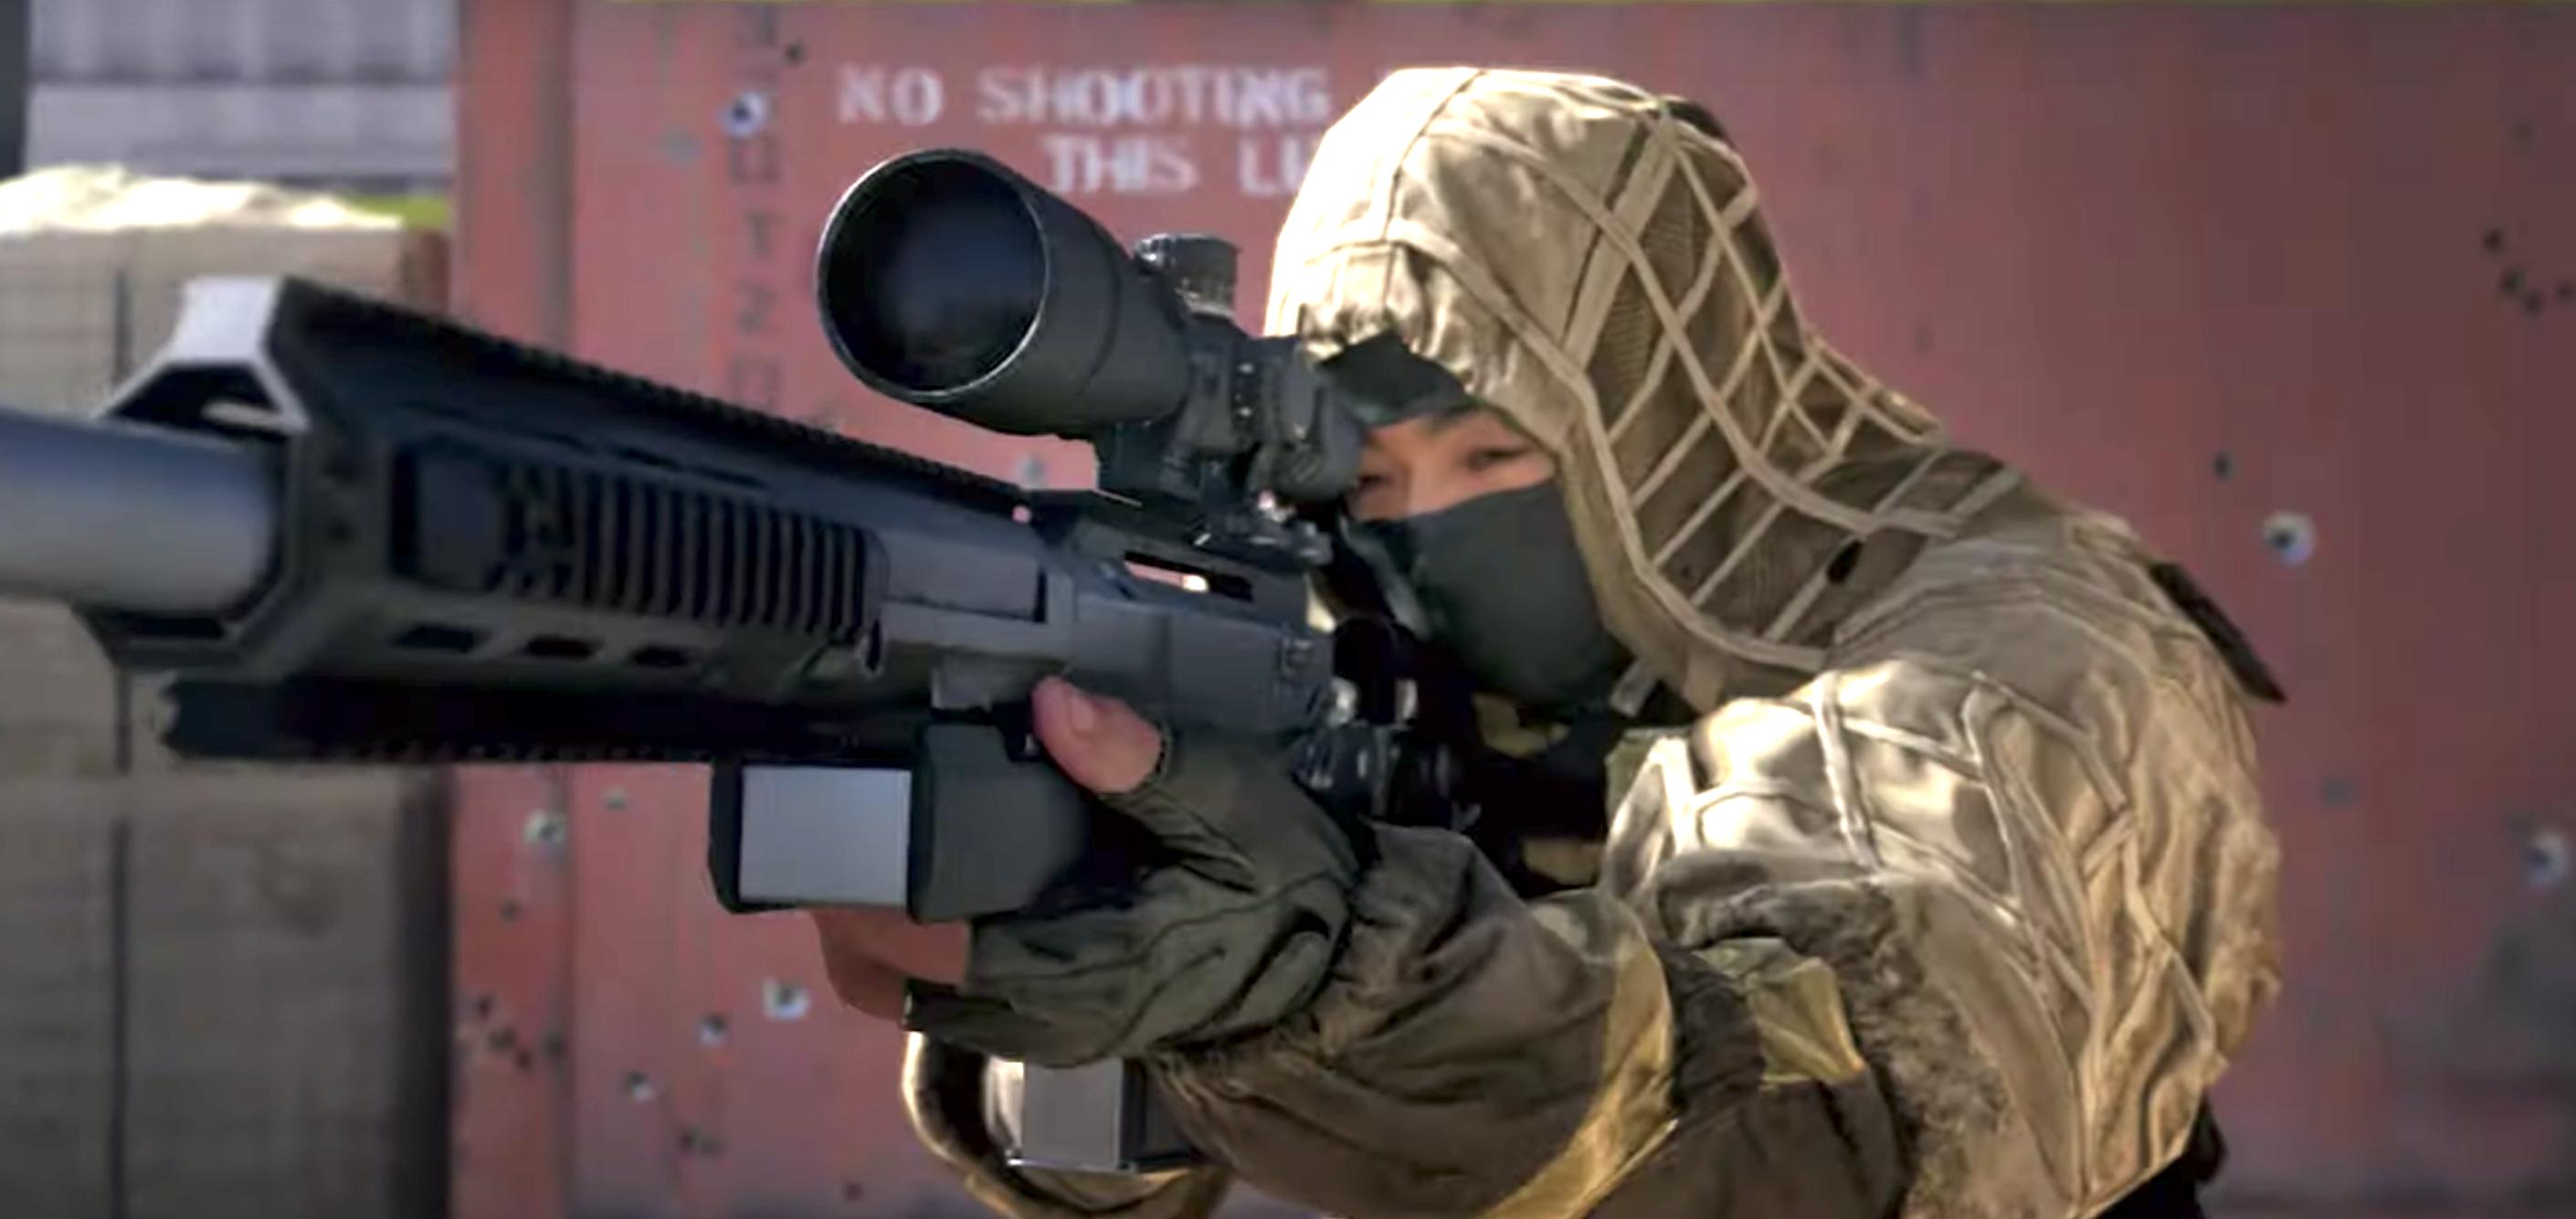 Call of Duty: Modern Warfare is getting a new multiplayer Gunfight mode